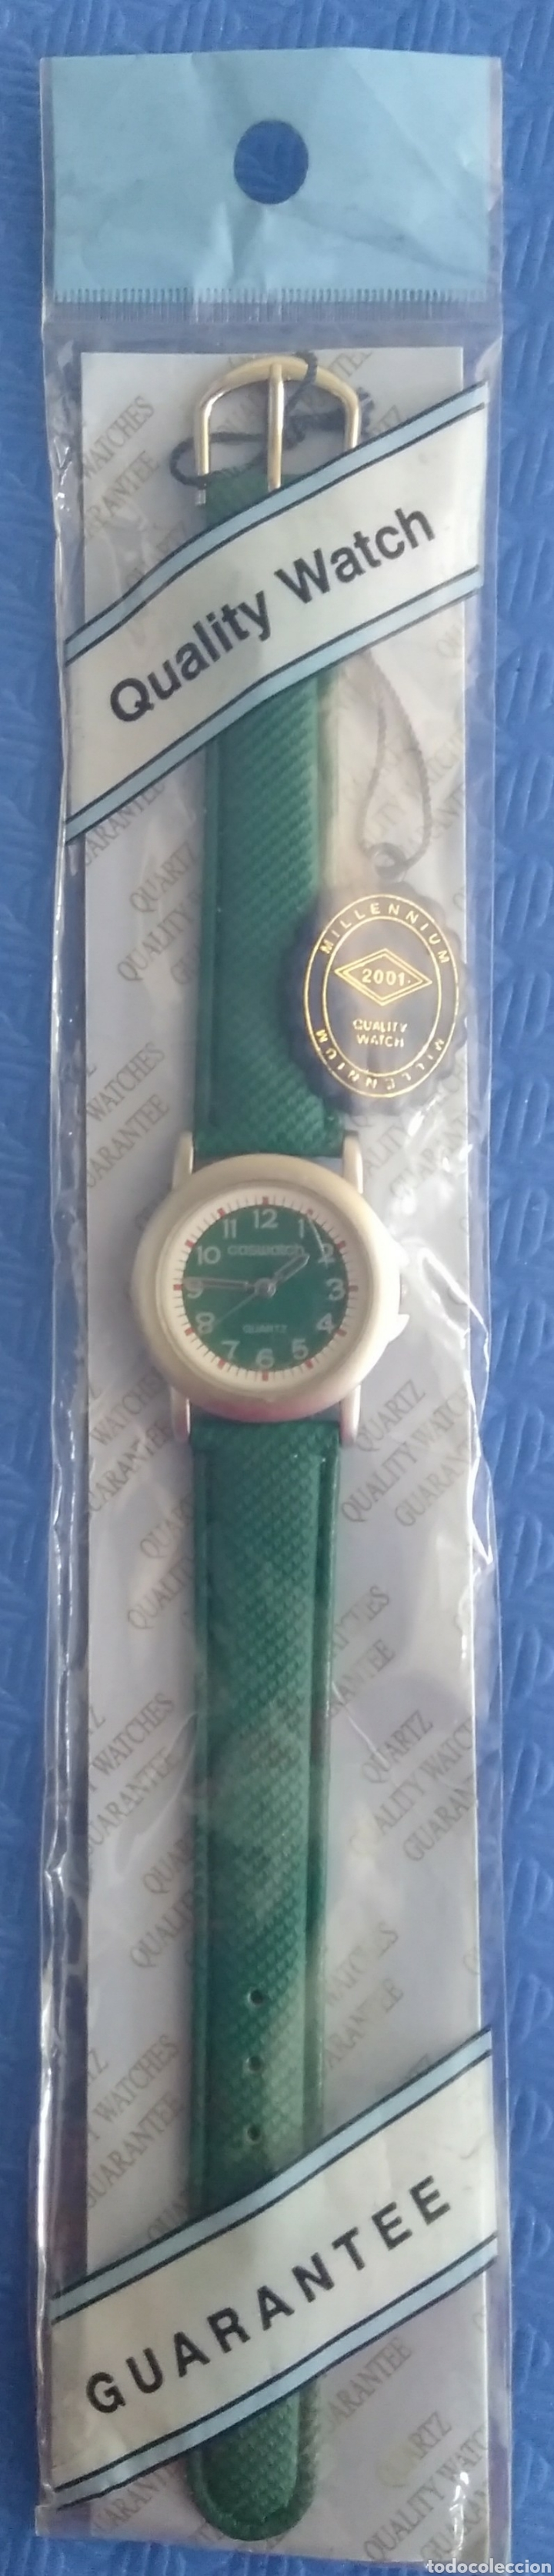 Relojes: Reloj Caswatch - Foto 2 - 167961908